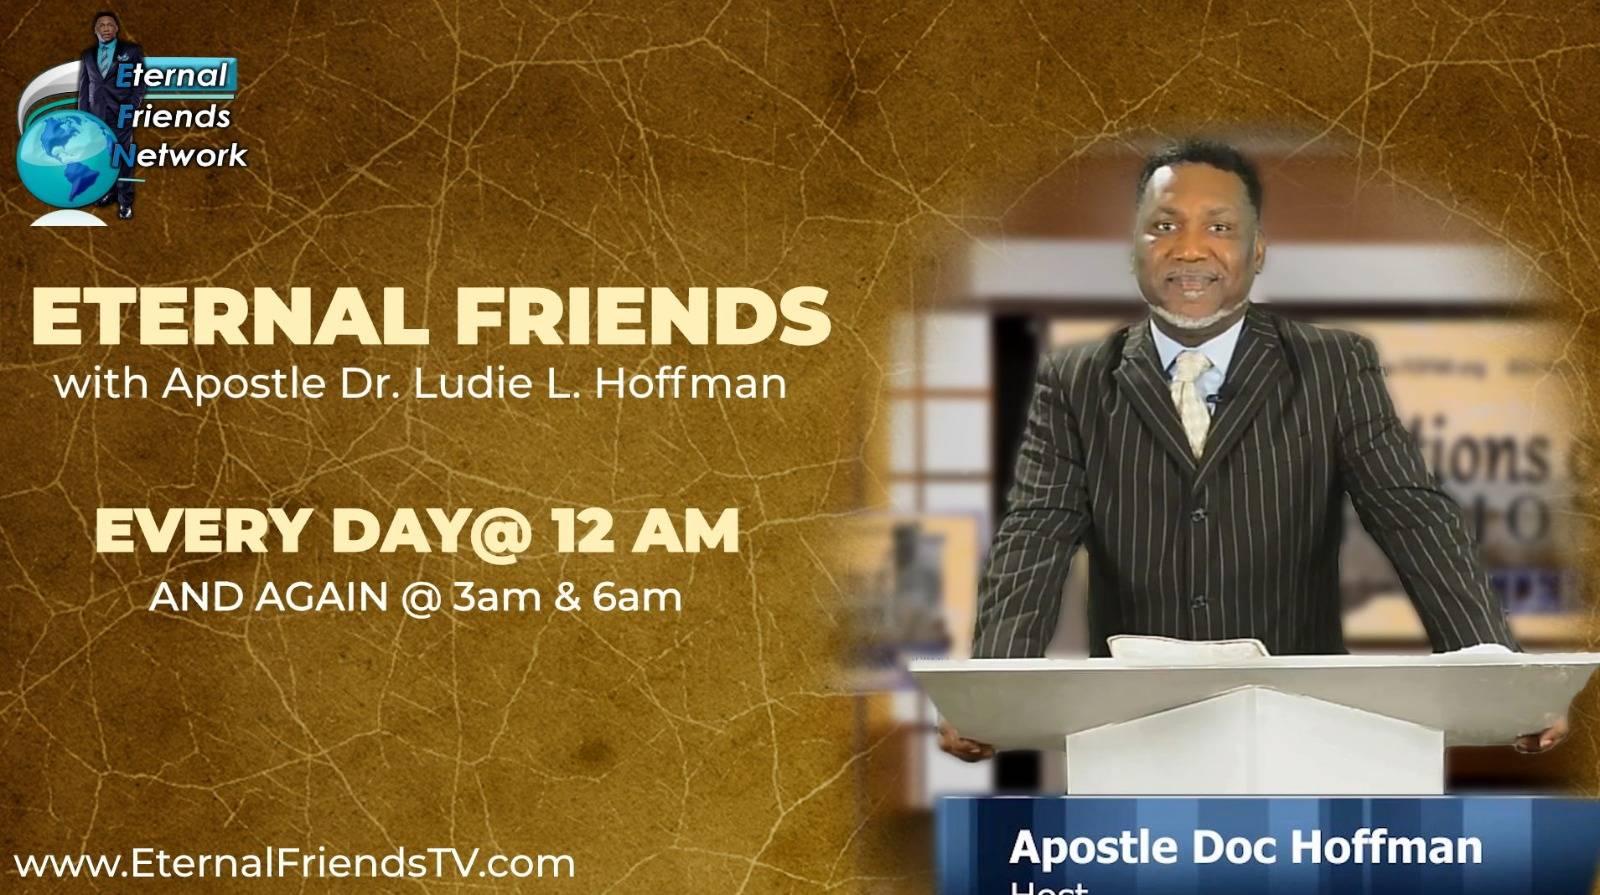 Eternal Friends with Apostle Dr. Ludie L. Hoffman